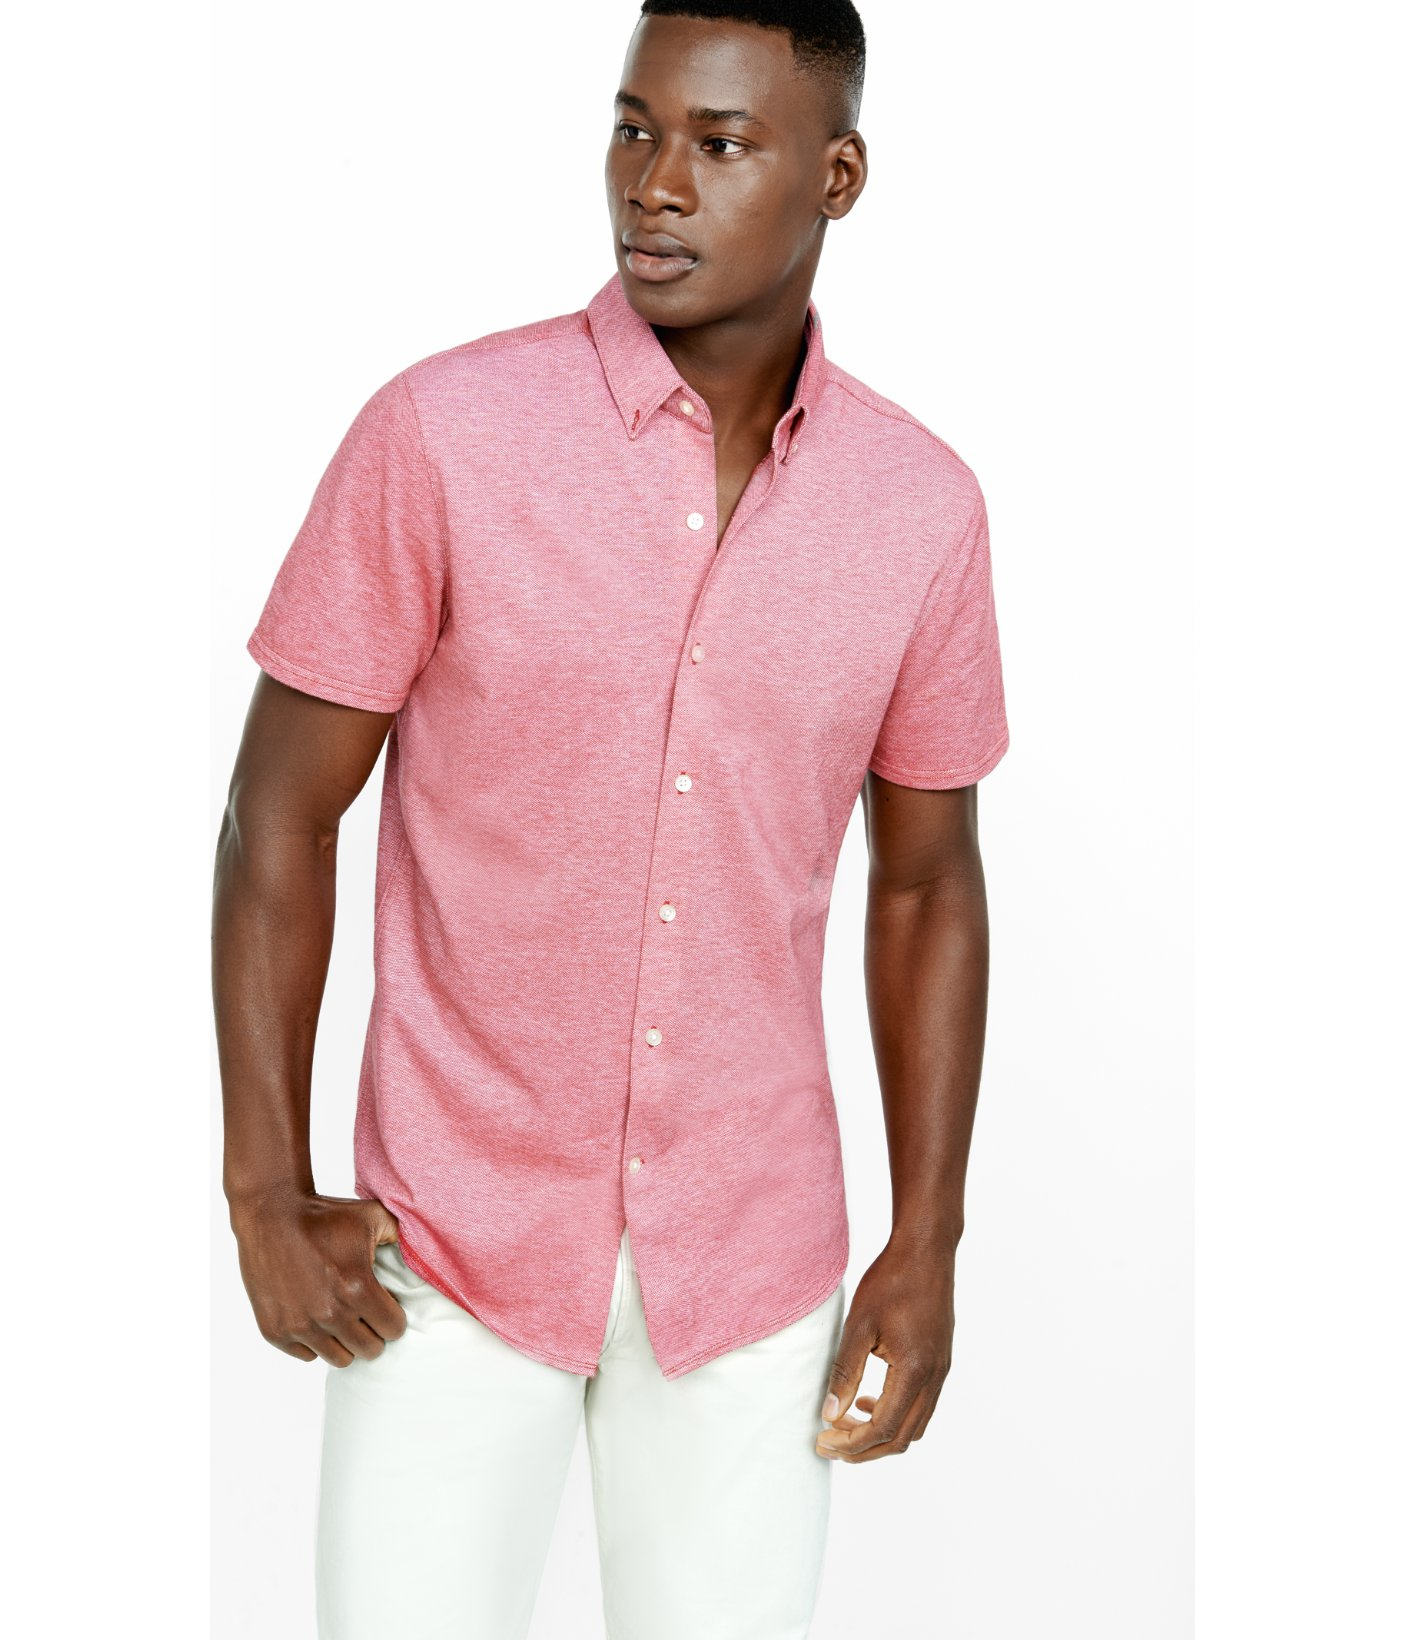 Express Pique Knit Short Sleeve Button Down Collar Shirt in Red ...